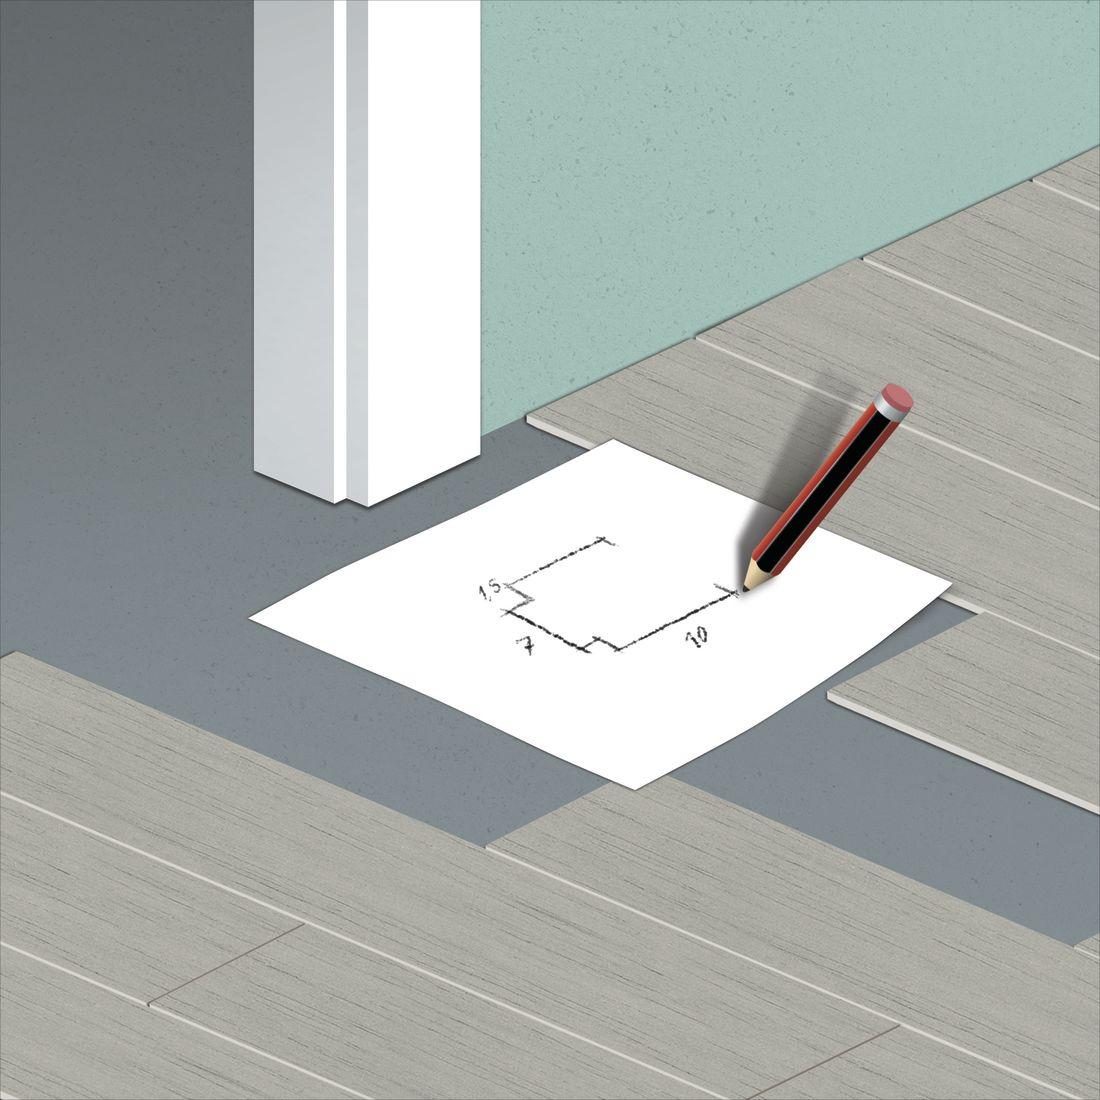 Posa pavimento pvc parquet flottante prezzi pavimento - Posare piastrelle su pavimento esistente ...